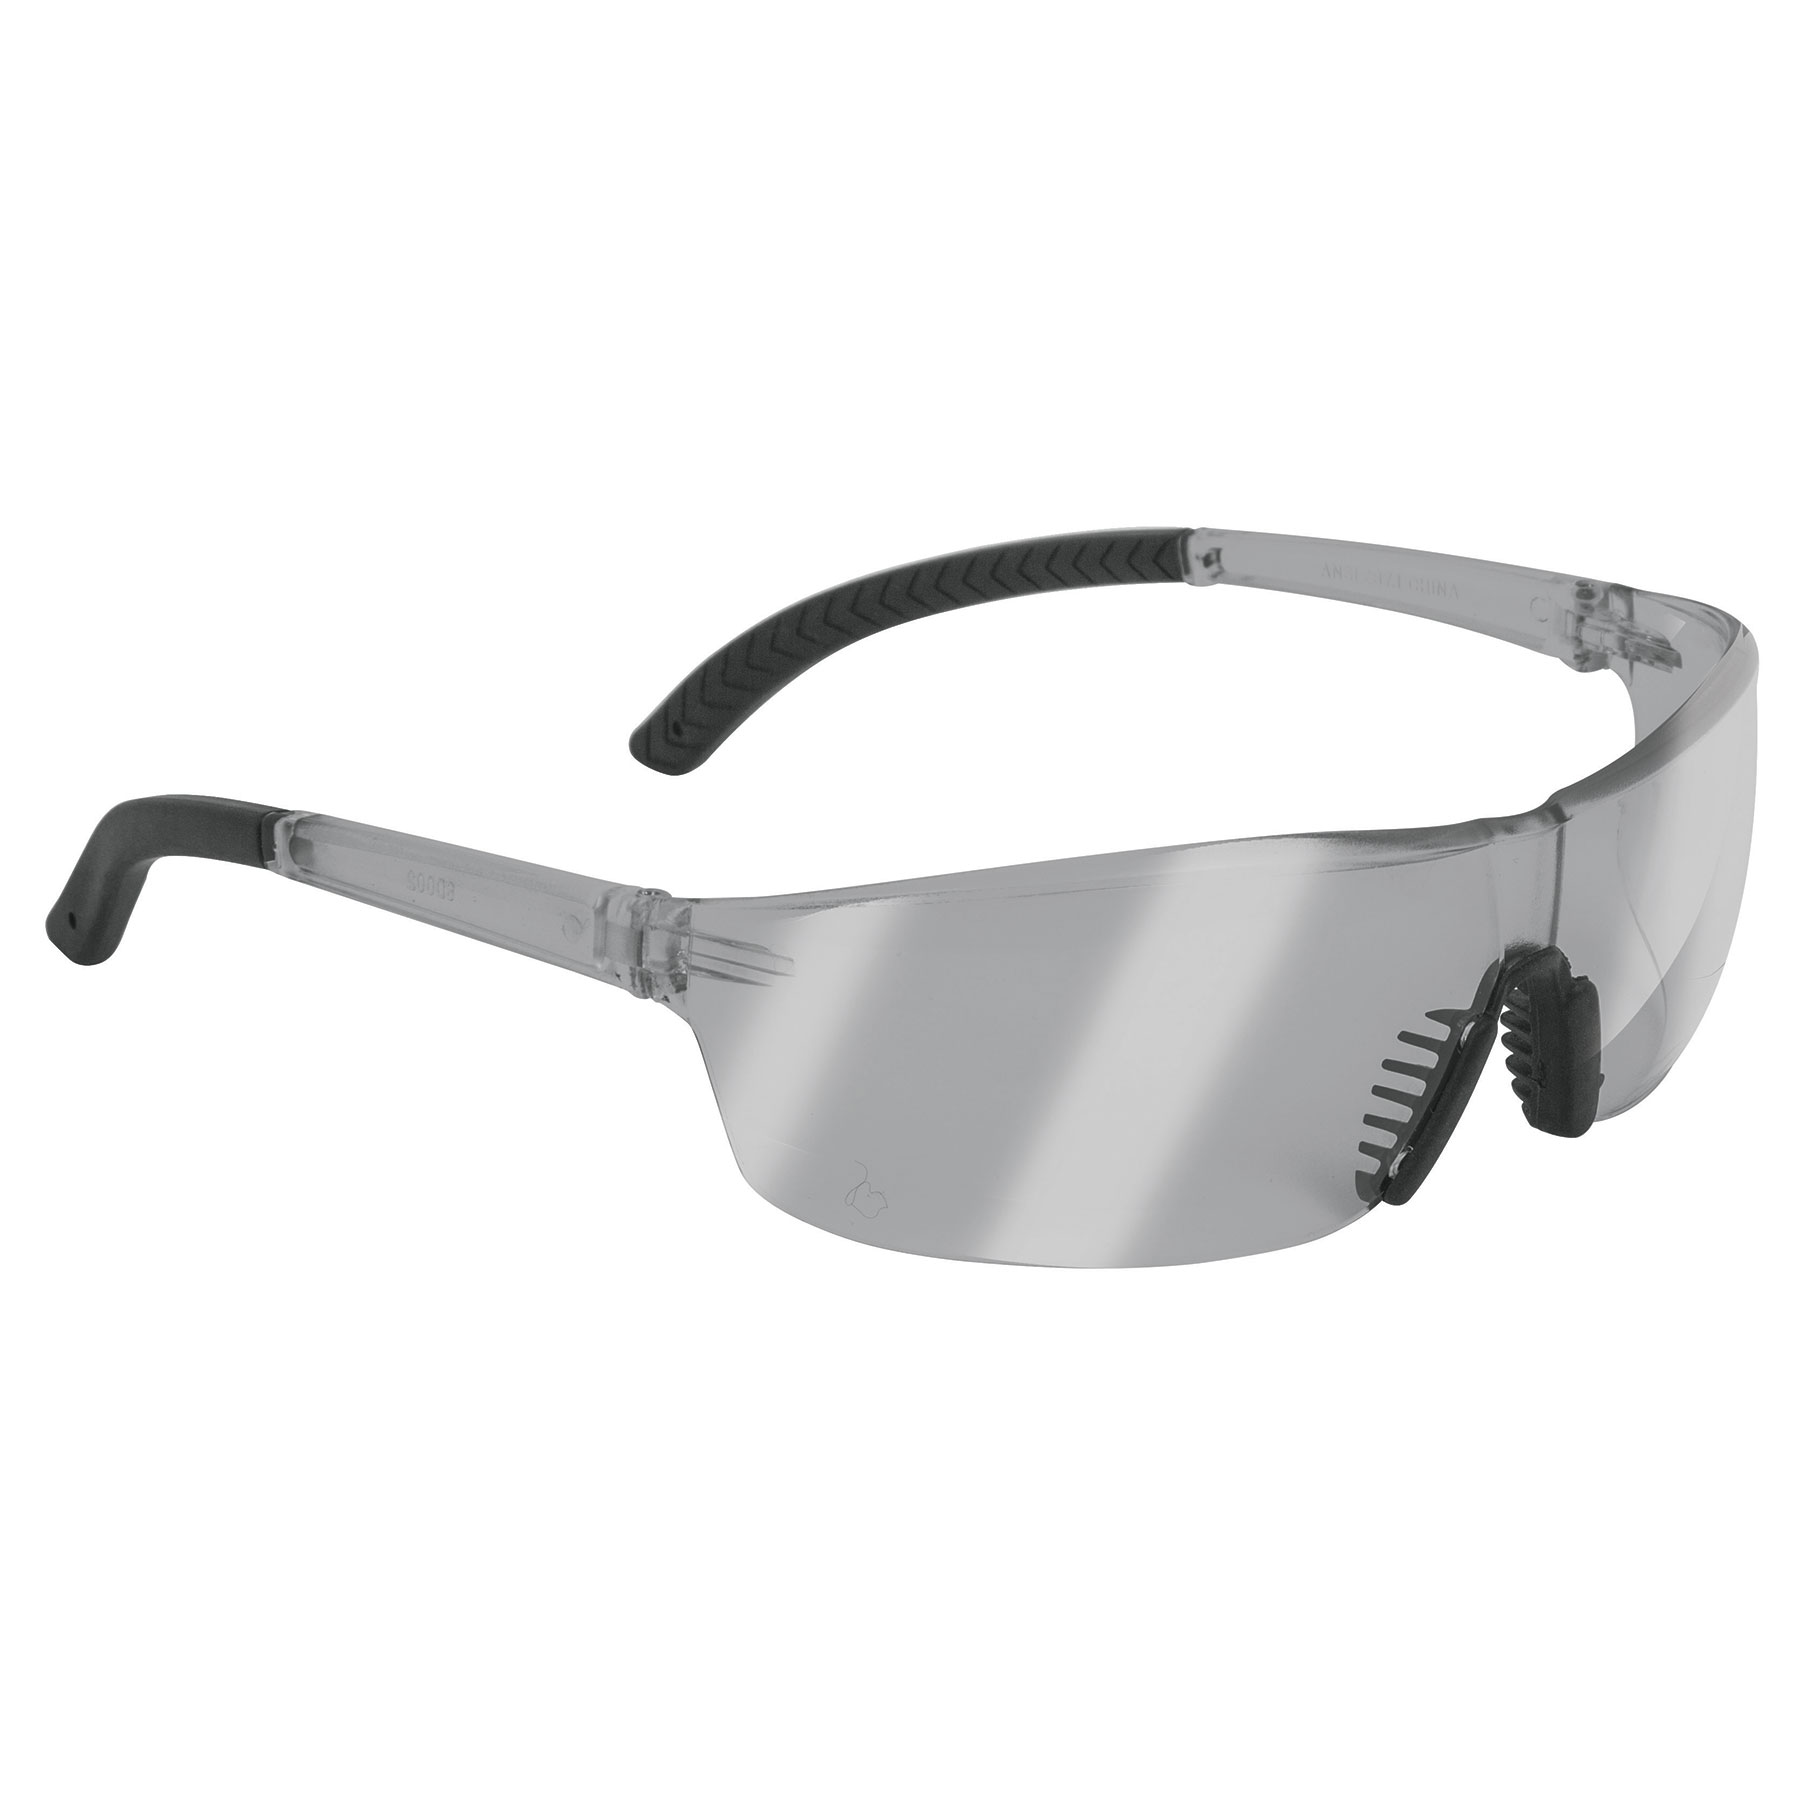 Lentes de seguridad, mica espejo plata, Ultralite